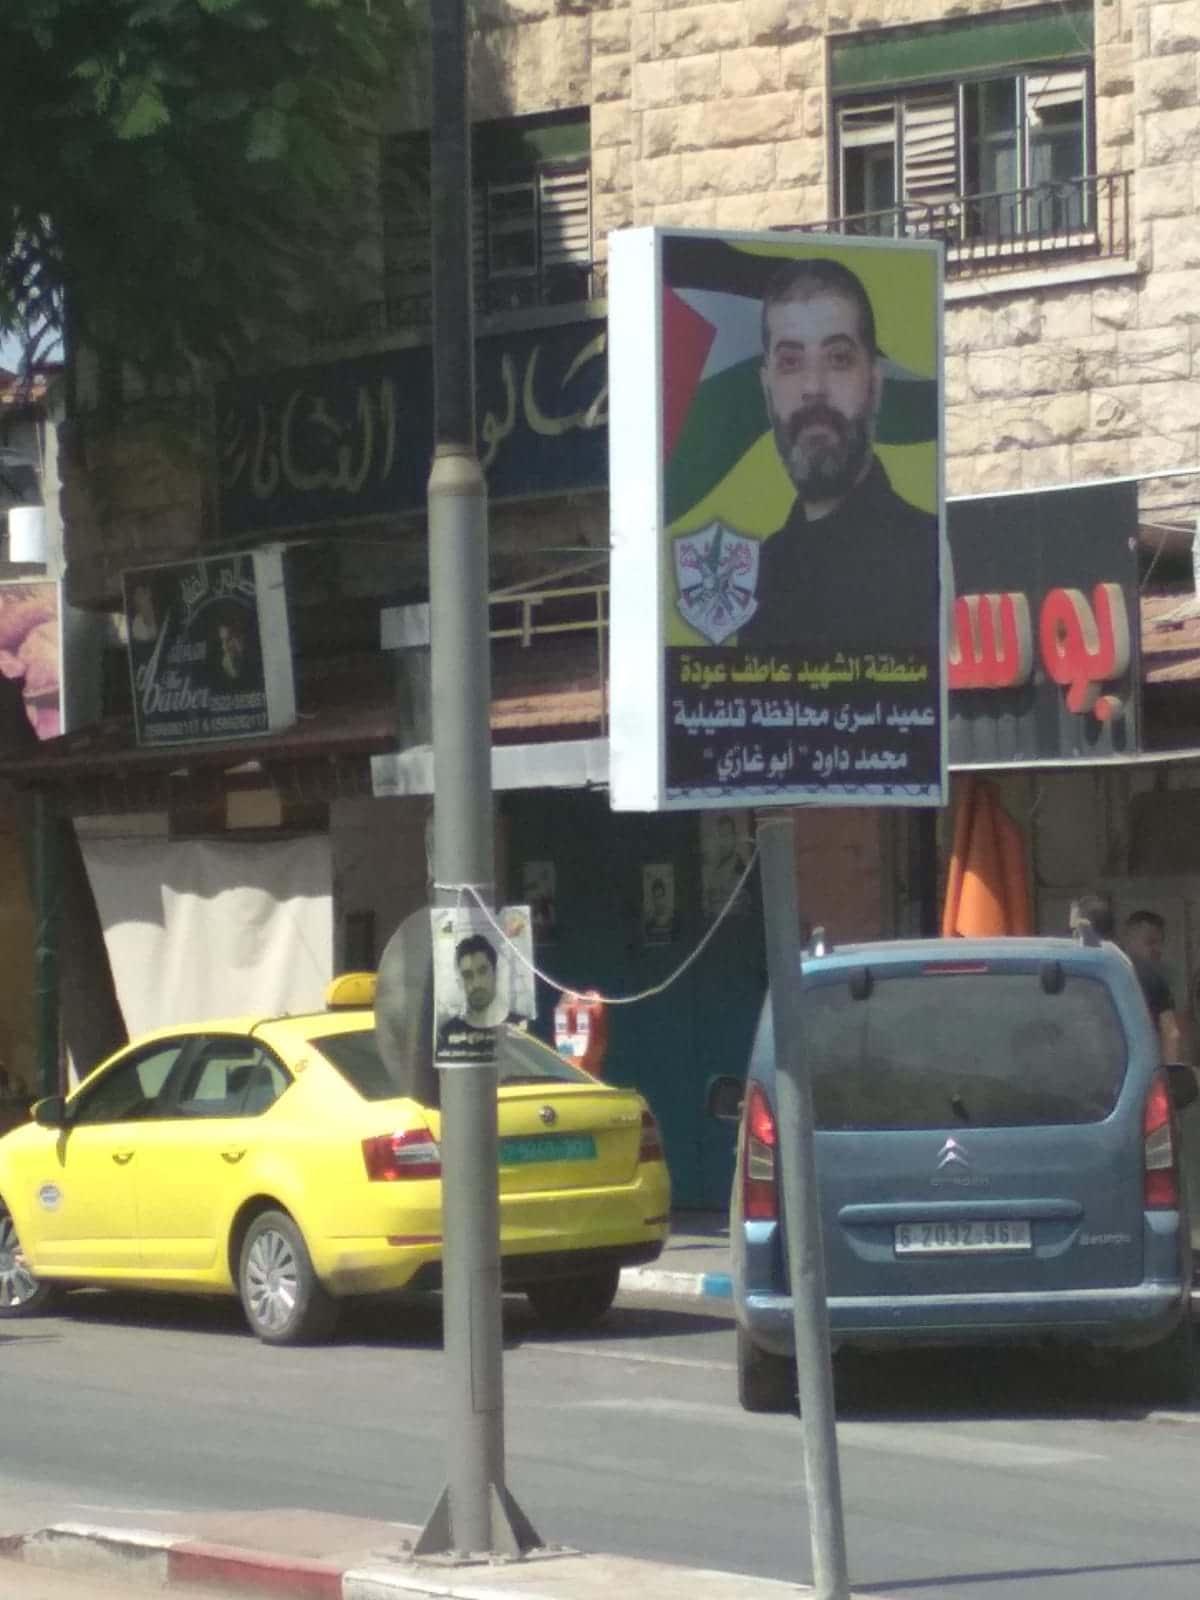 Terroristy na plakatah v Ierihone